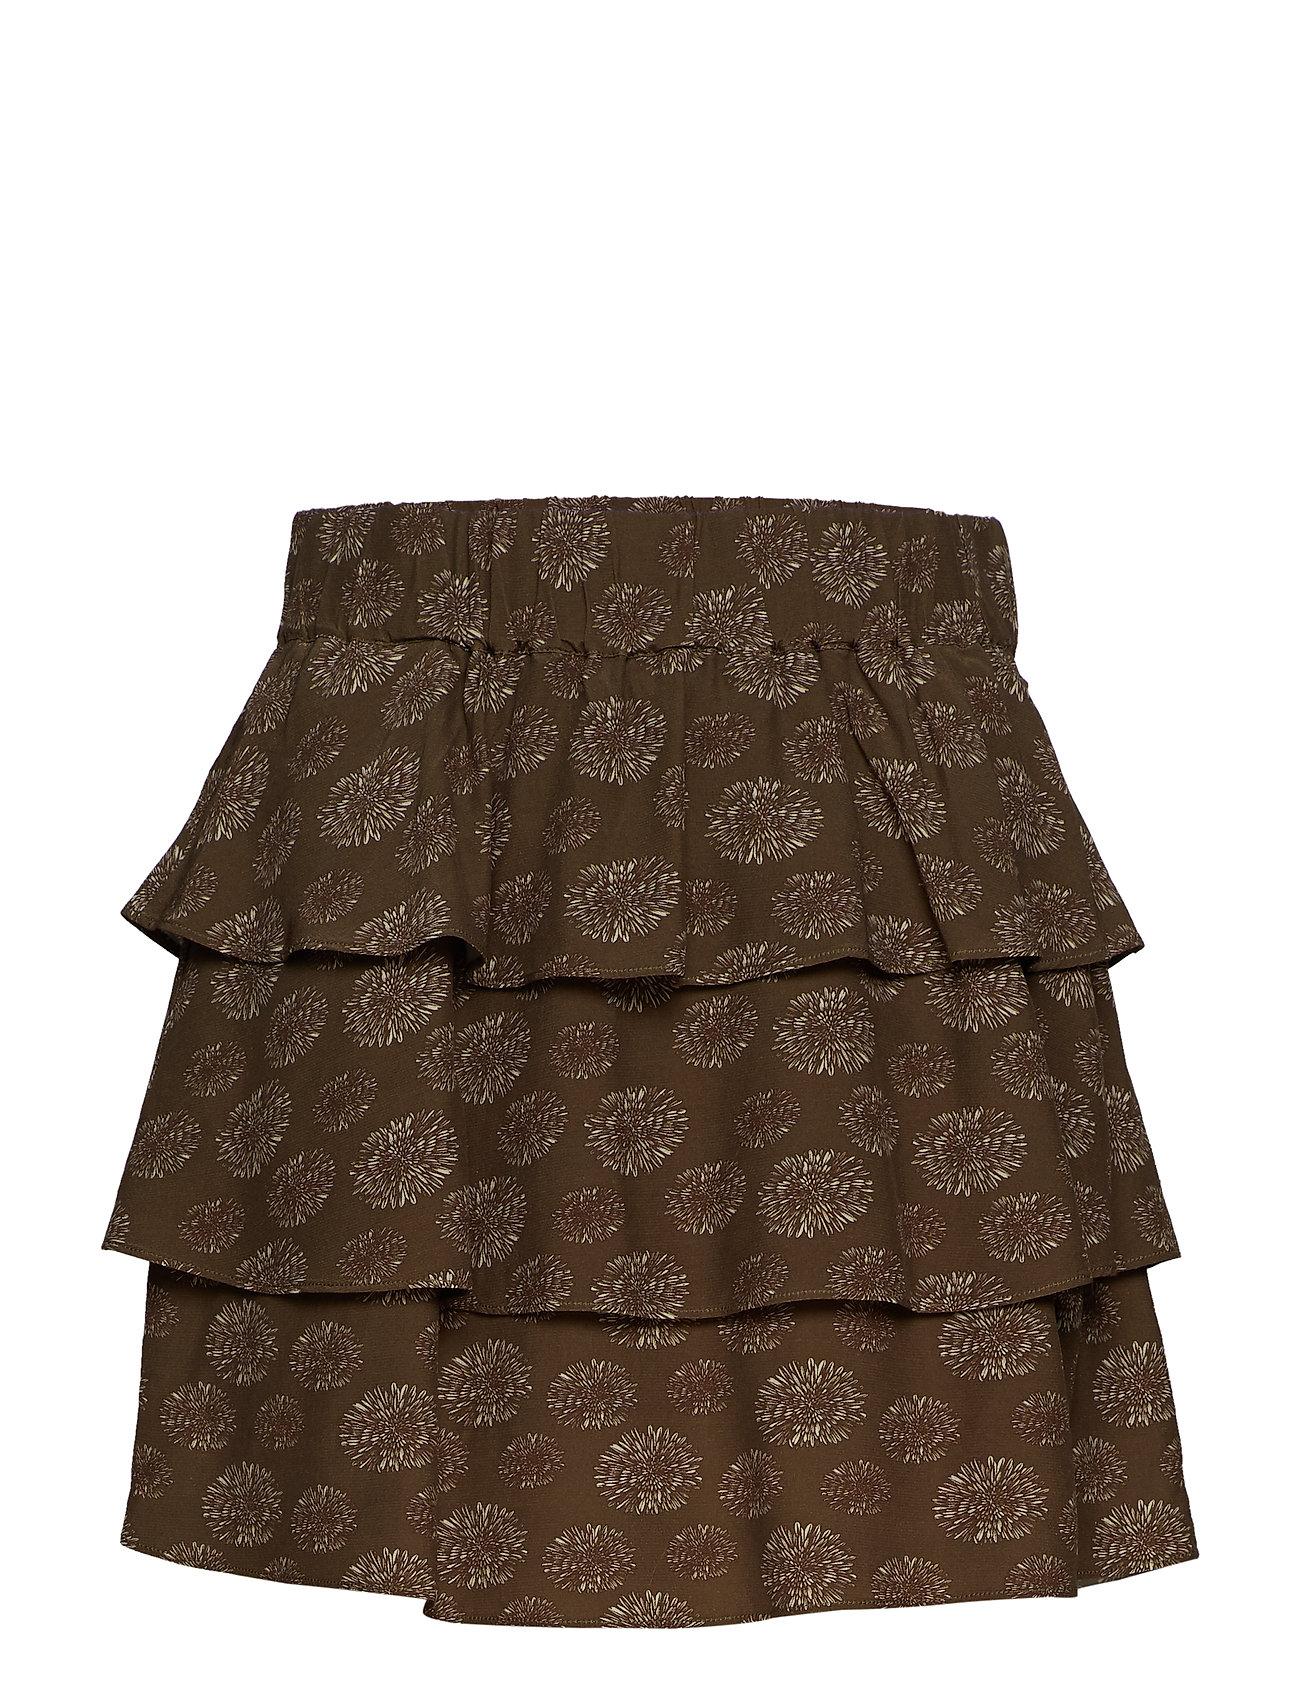 Mayla Stockholm Ariana Mini Skirt - DANDELION PRINT